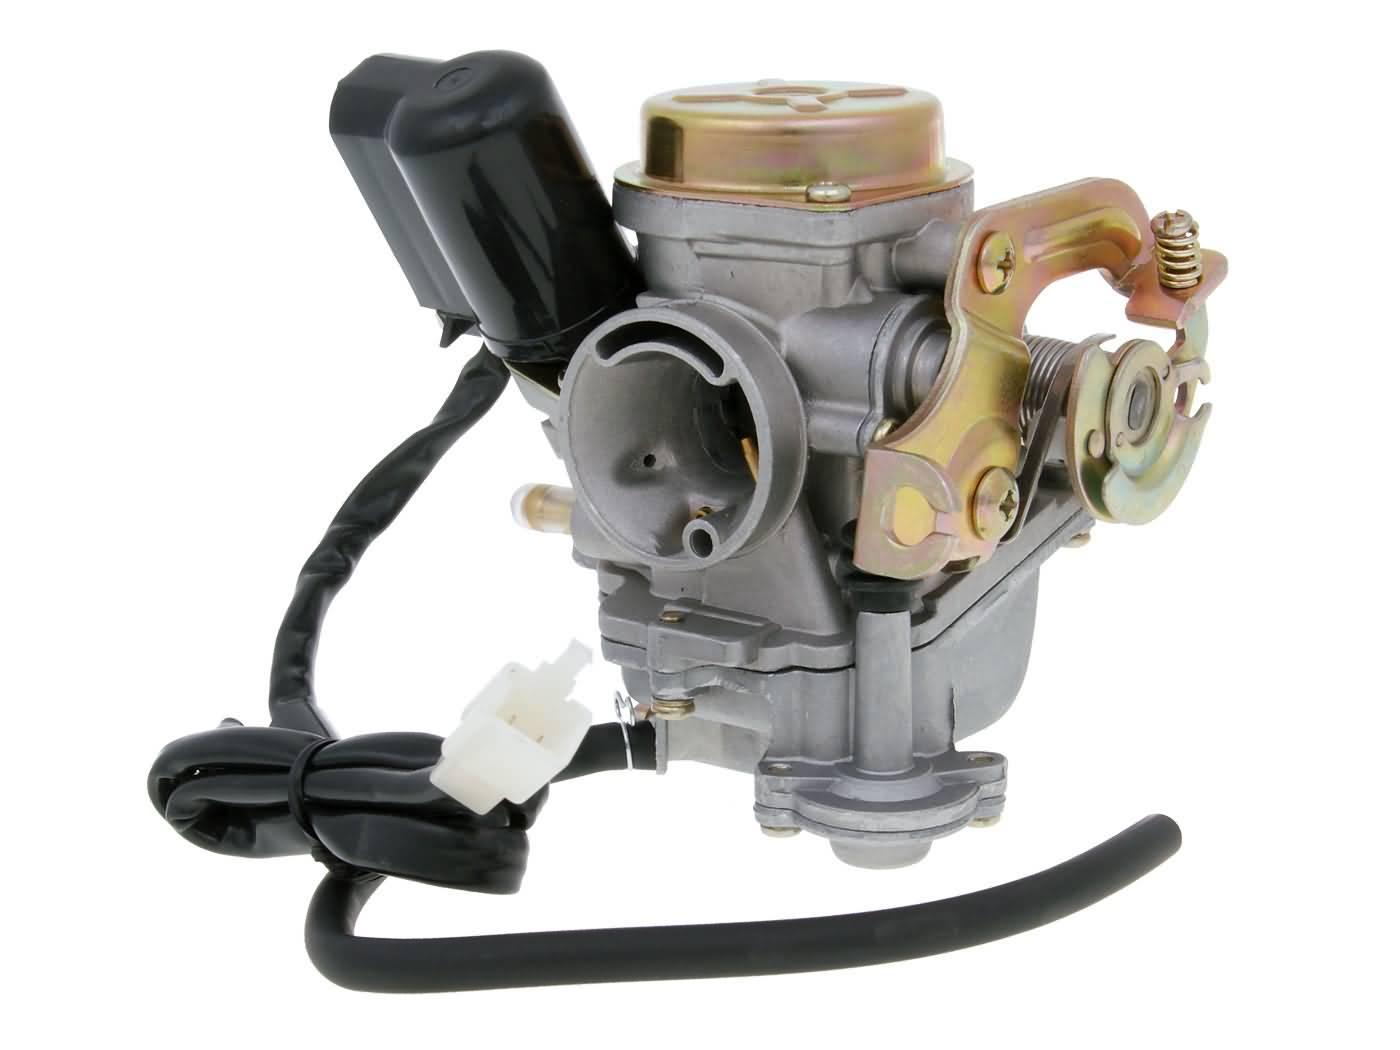 OEM carburateur 4 T-roller pour Kymco Super 8 50 ARRECHE E-Choke NARAKU pour DELLORTO